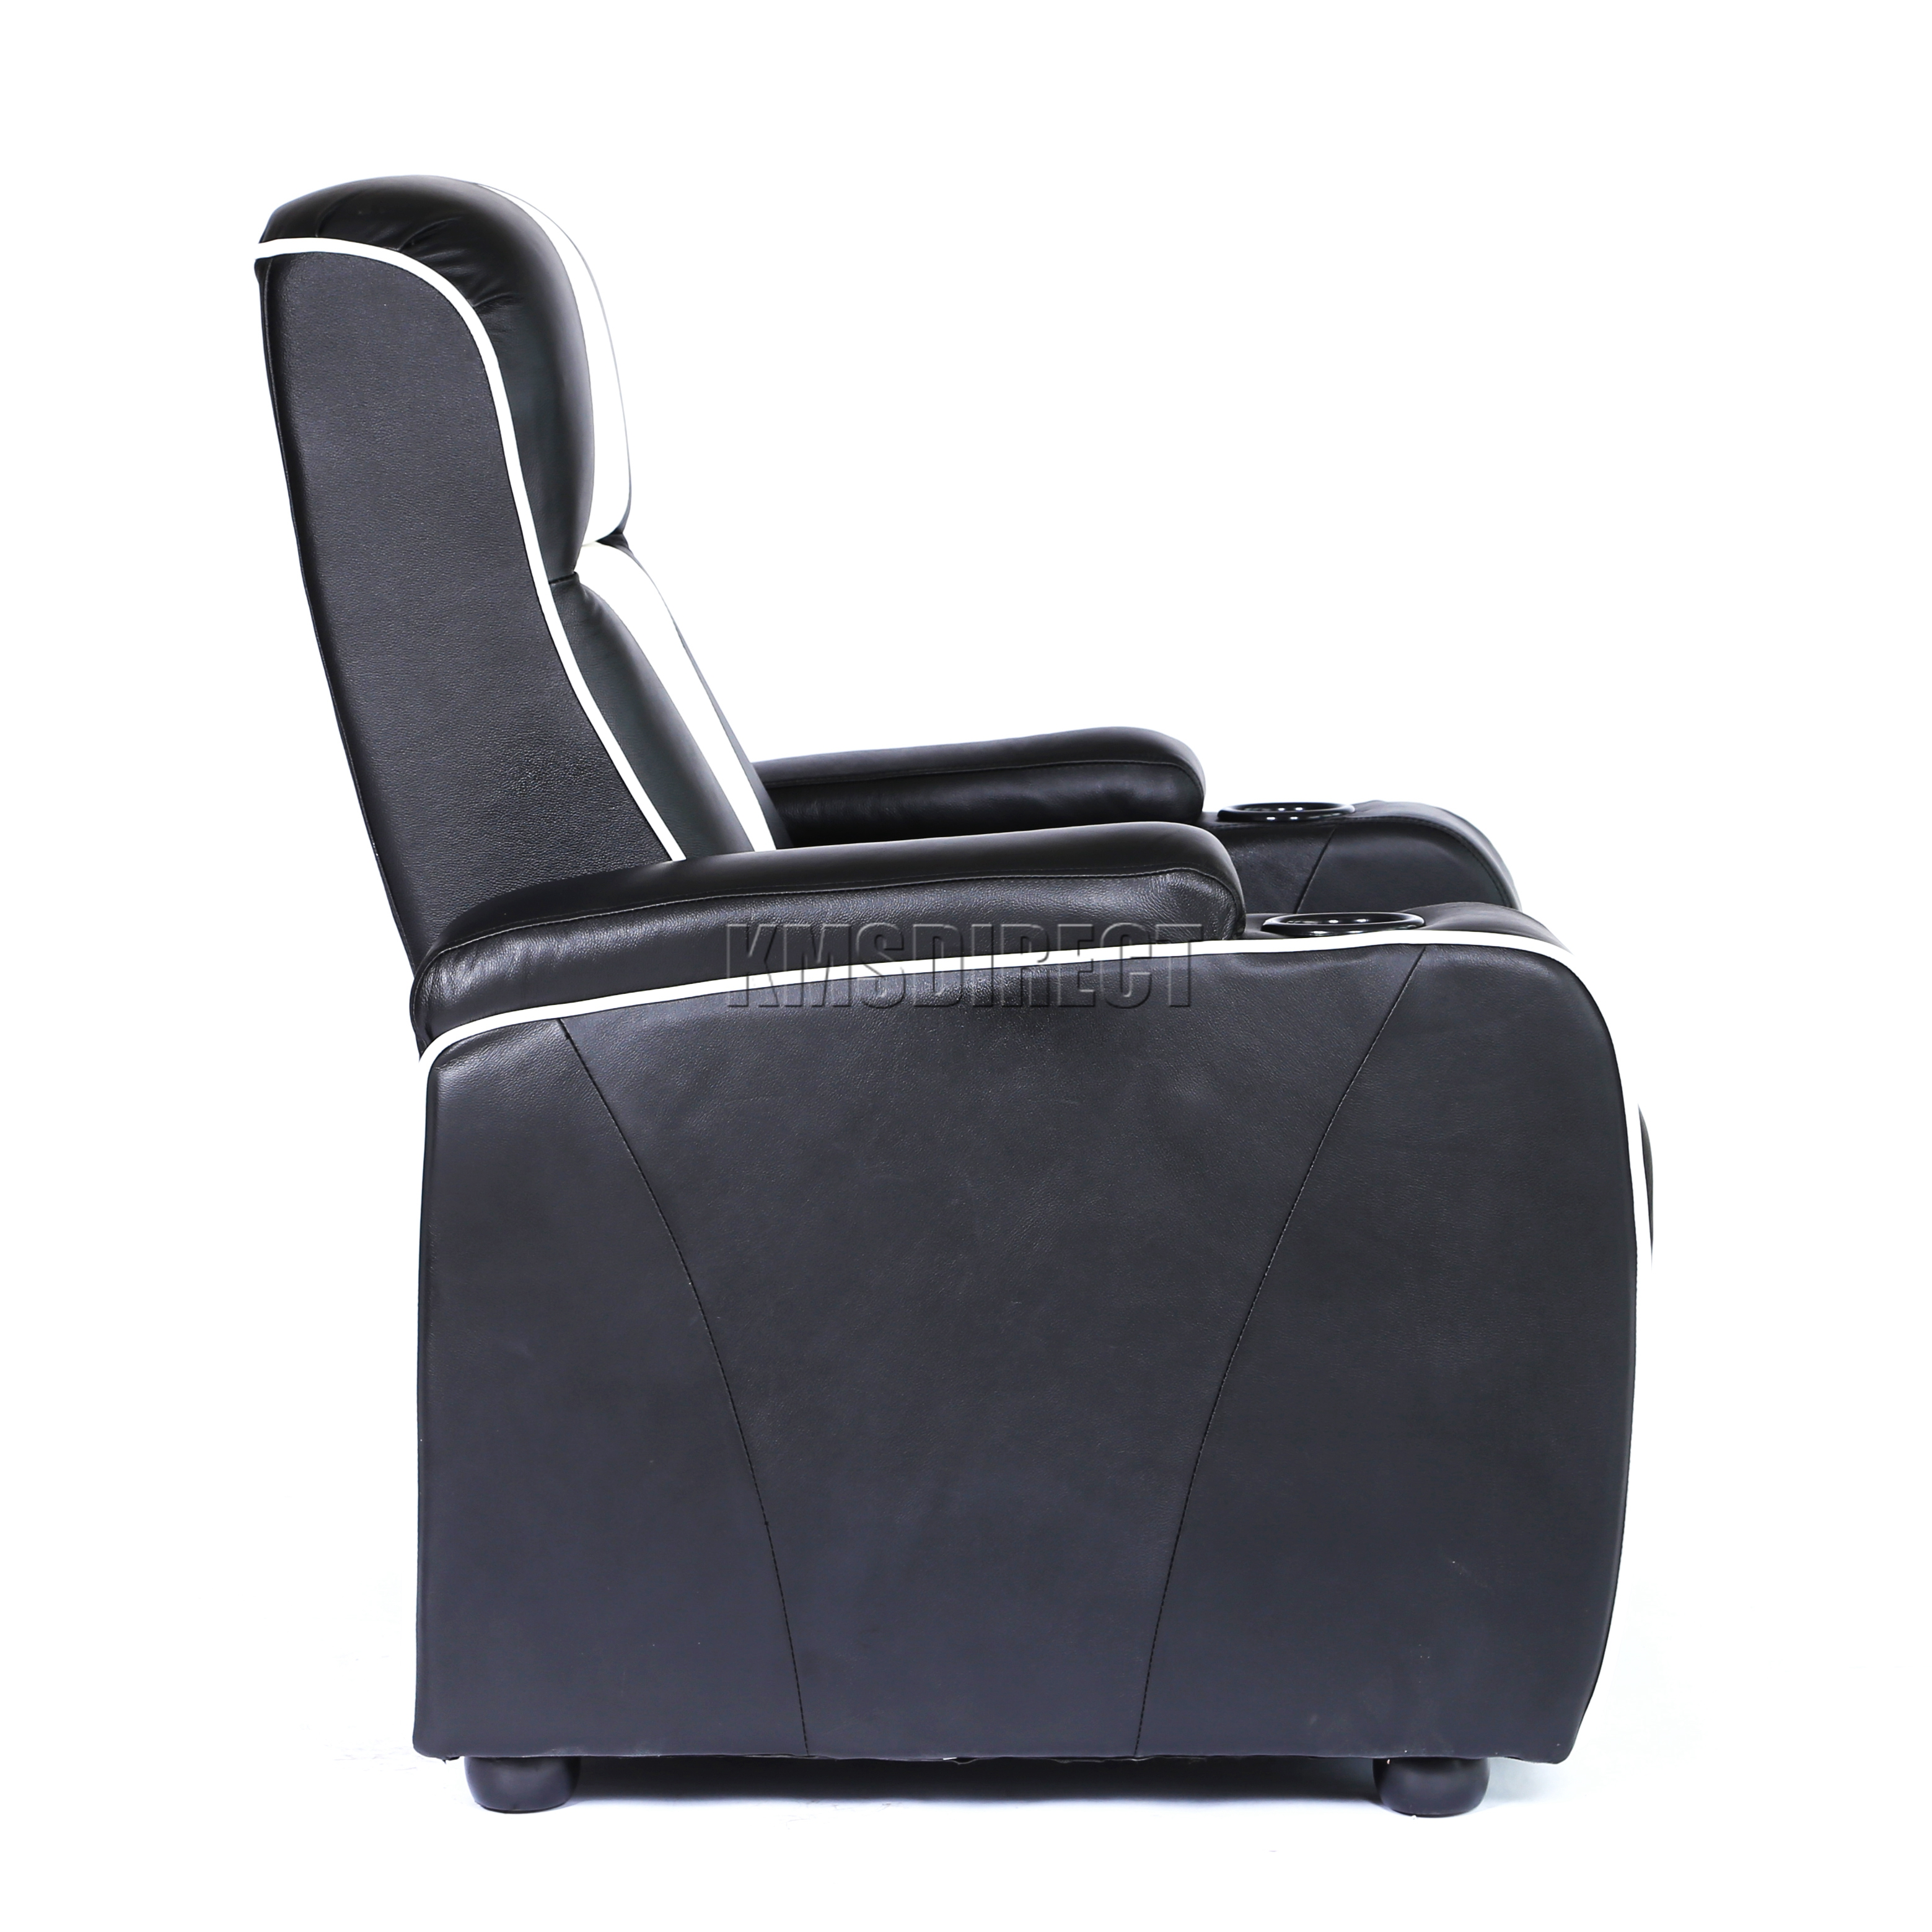 Leather Electric Recliner Sofa Uk: FoxHunter Leather Retro Theatre Cinema Movie Chair Sofa